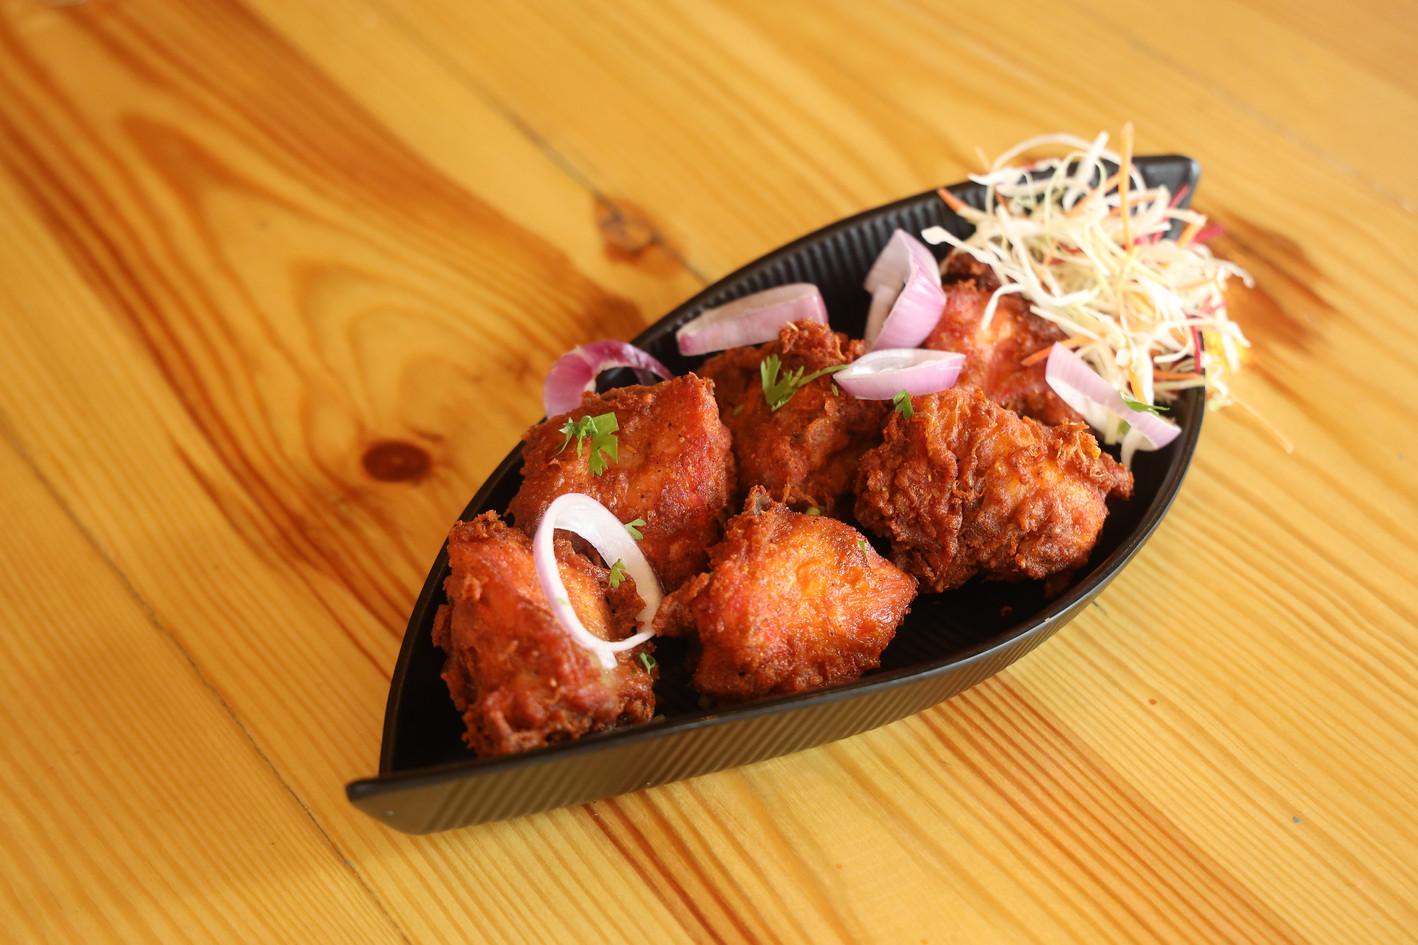 Tamilnadu chicken 65.JPG